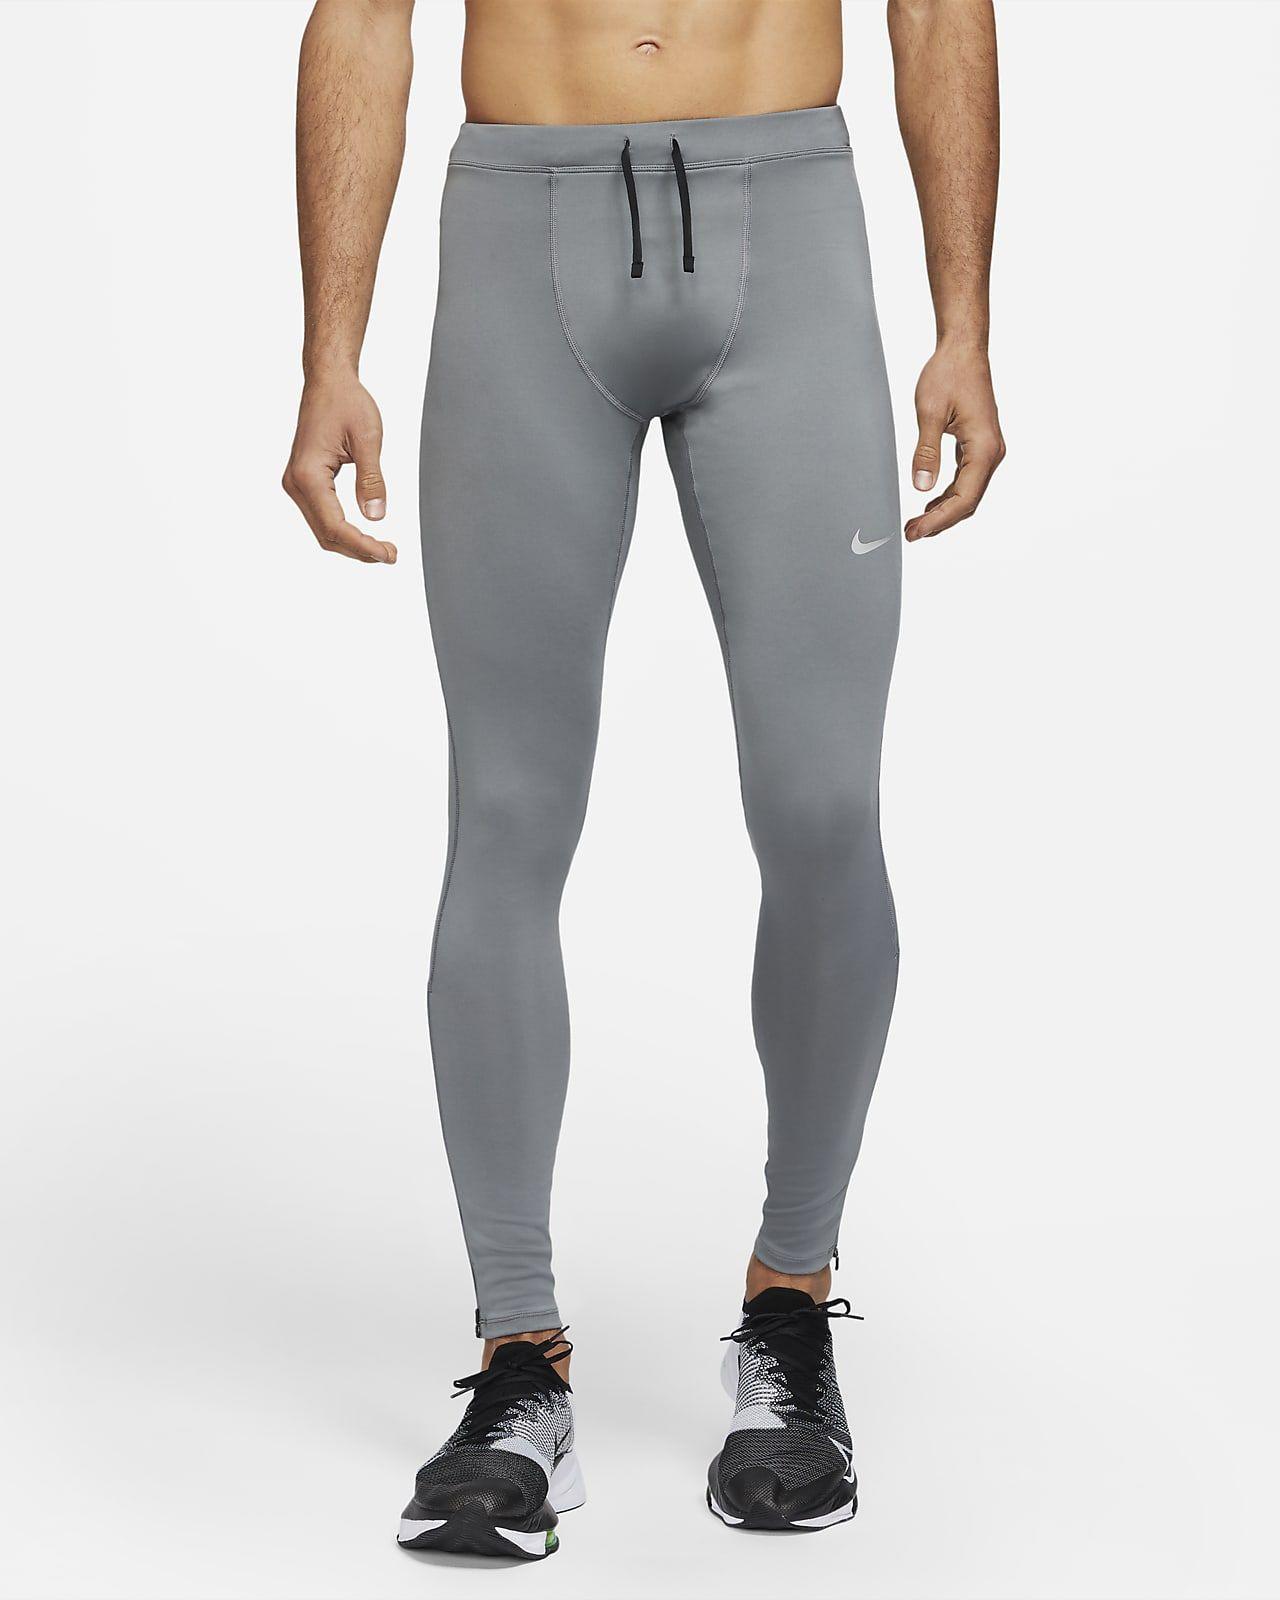 Legging de running Homme Nike Dri-FIT Challenger (Taille S à 2XL)